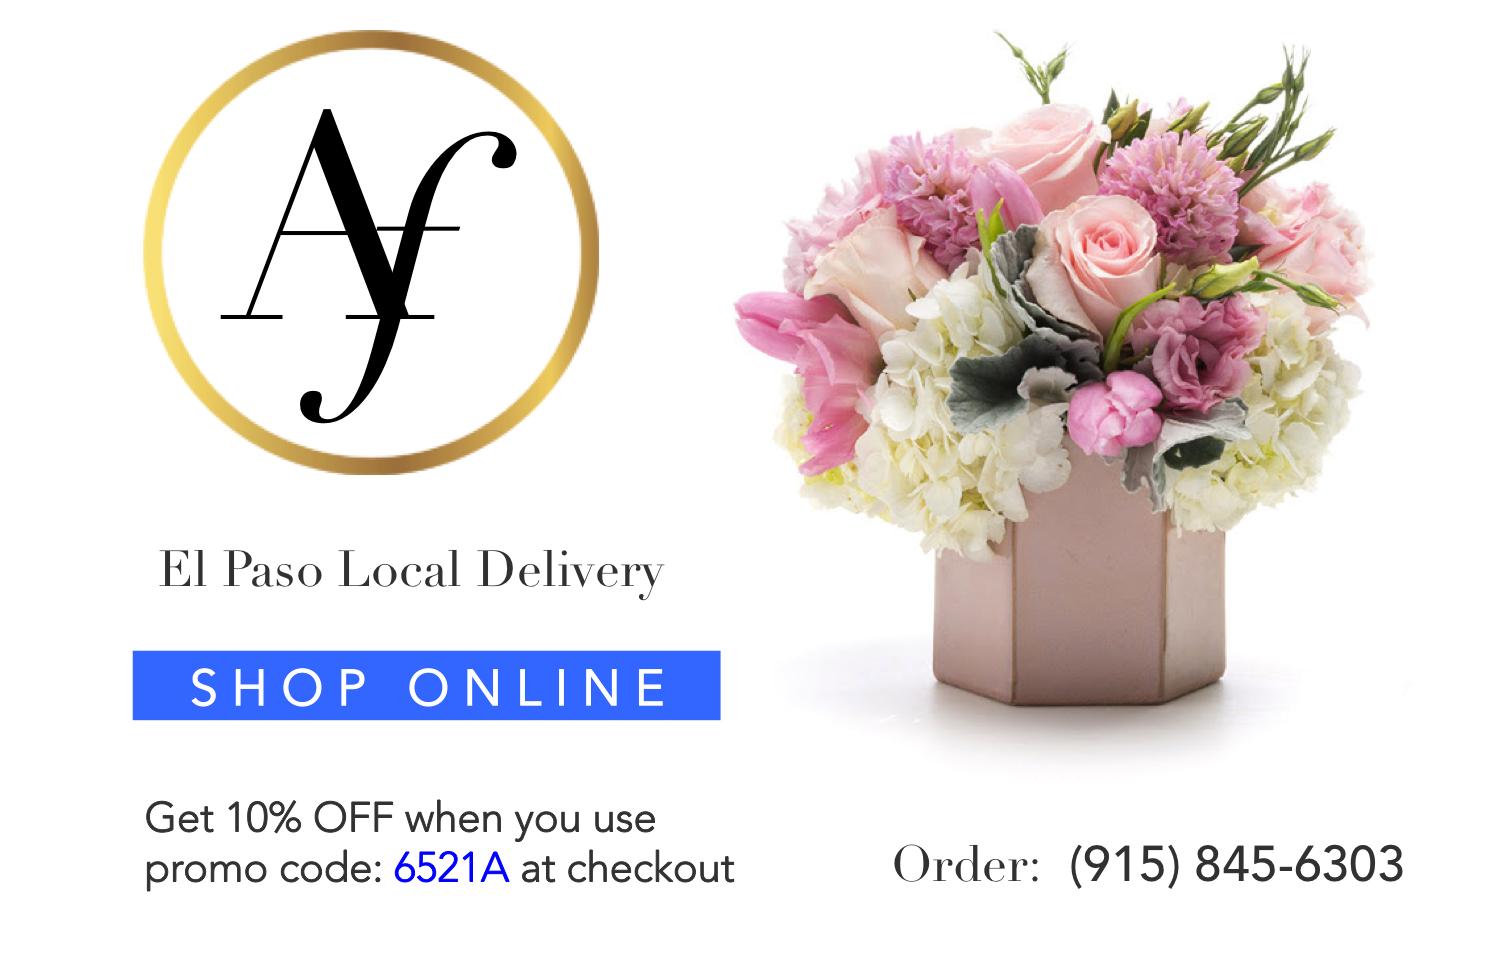 79912-angies-1-floral-designs-el-paso-florist-79912.png